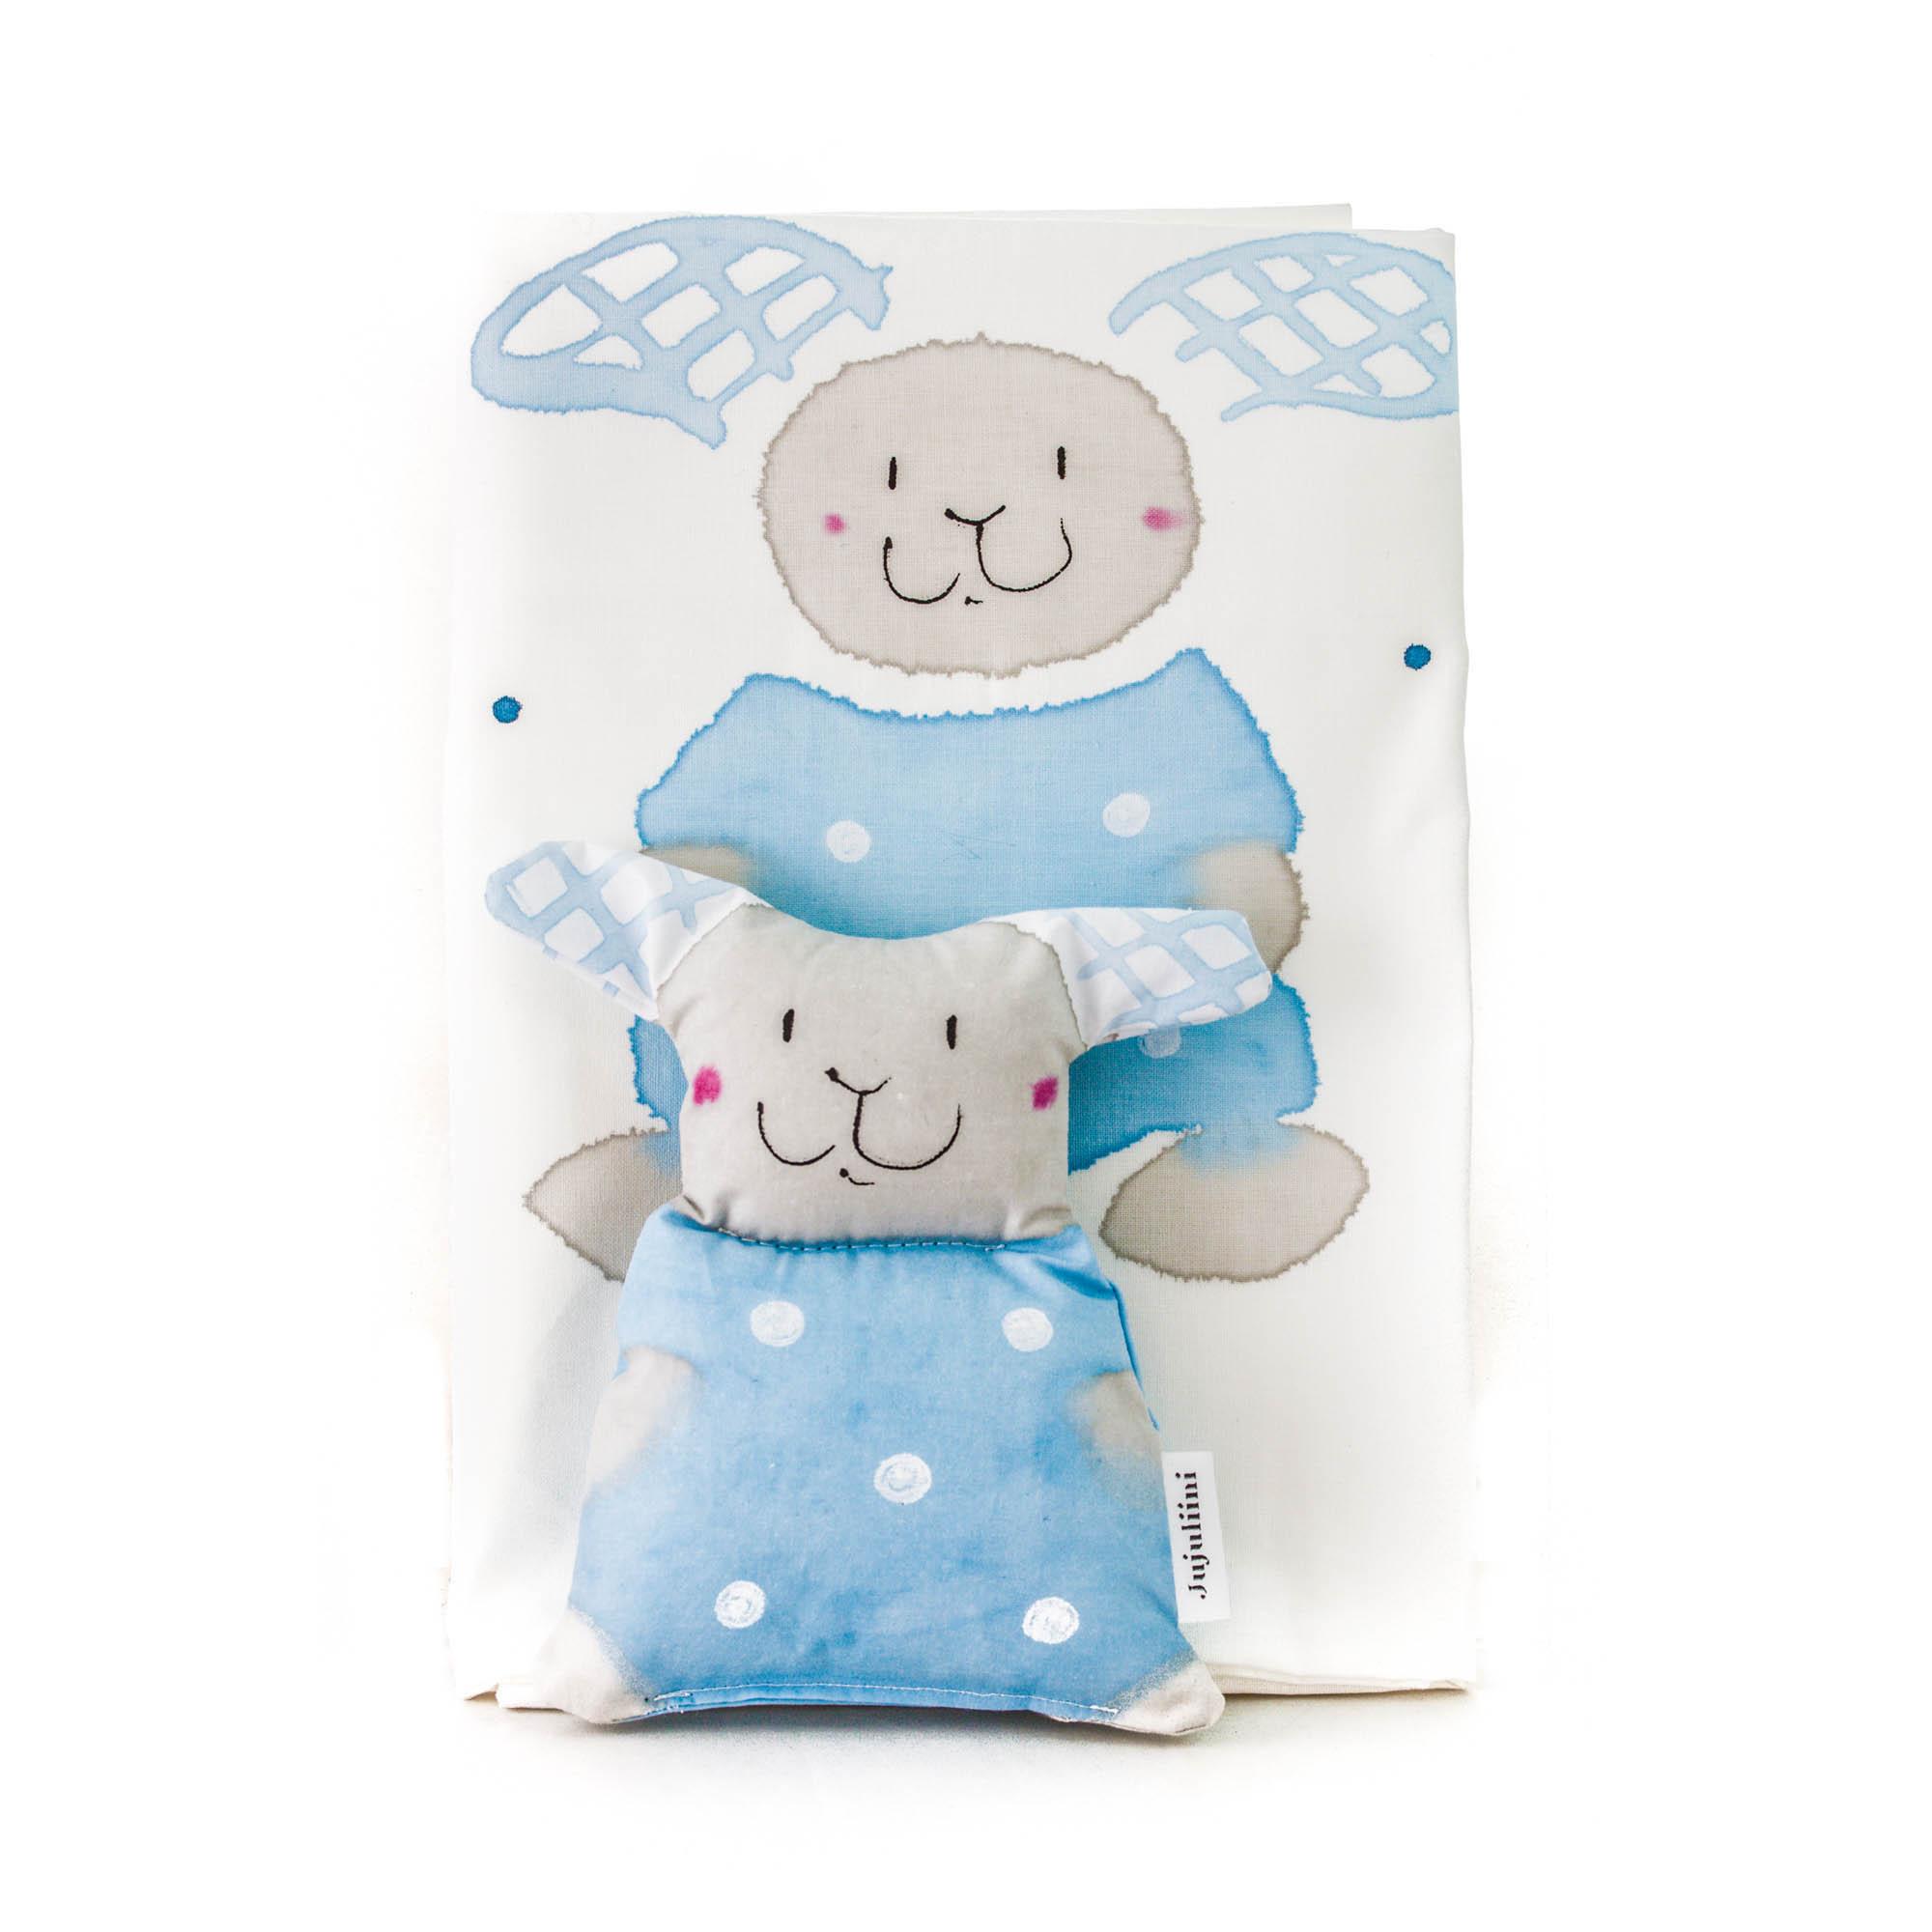 Jujuliini örngott med leksak kanin blå